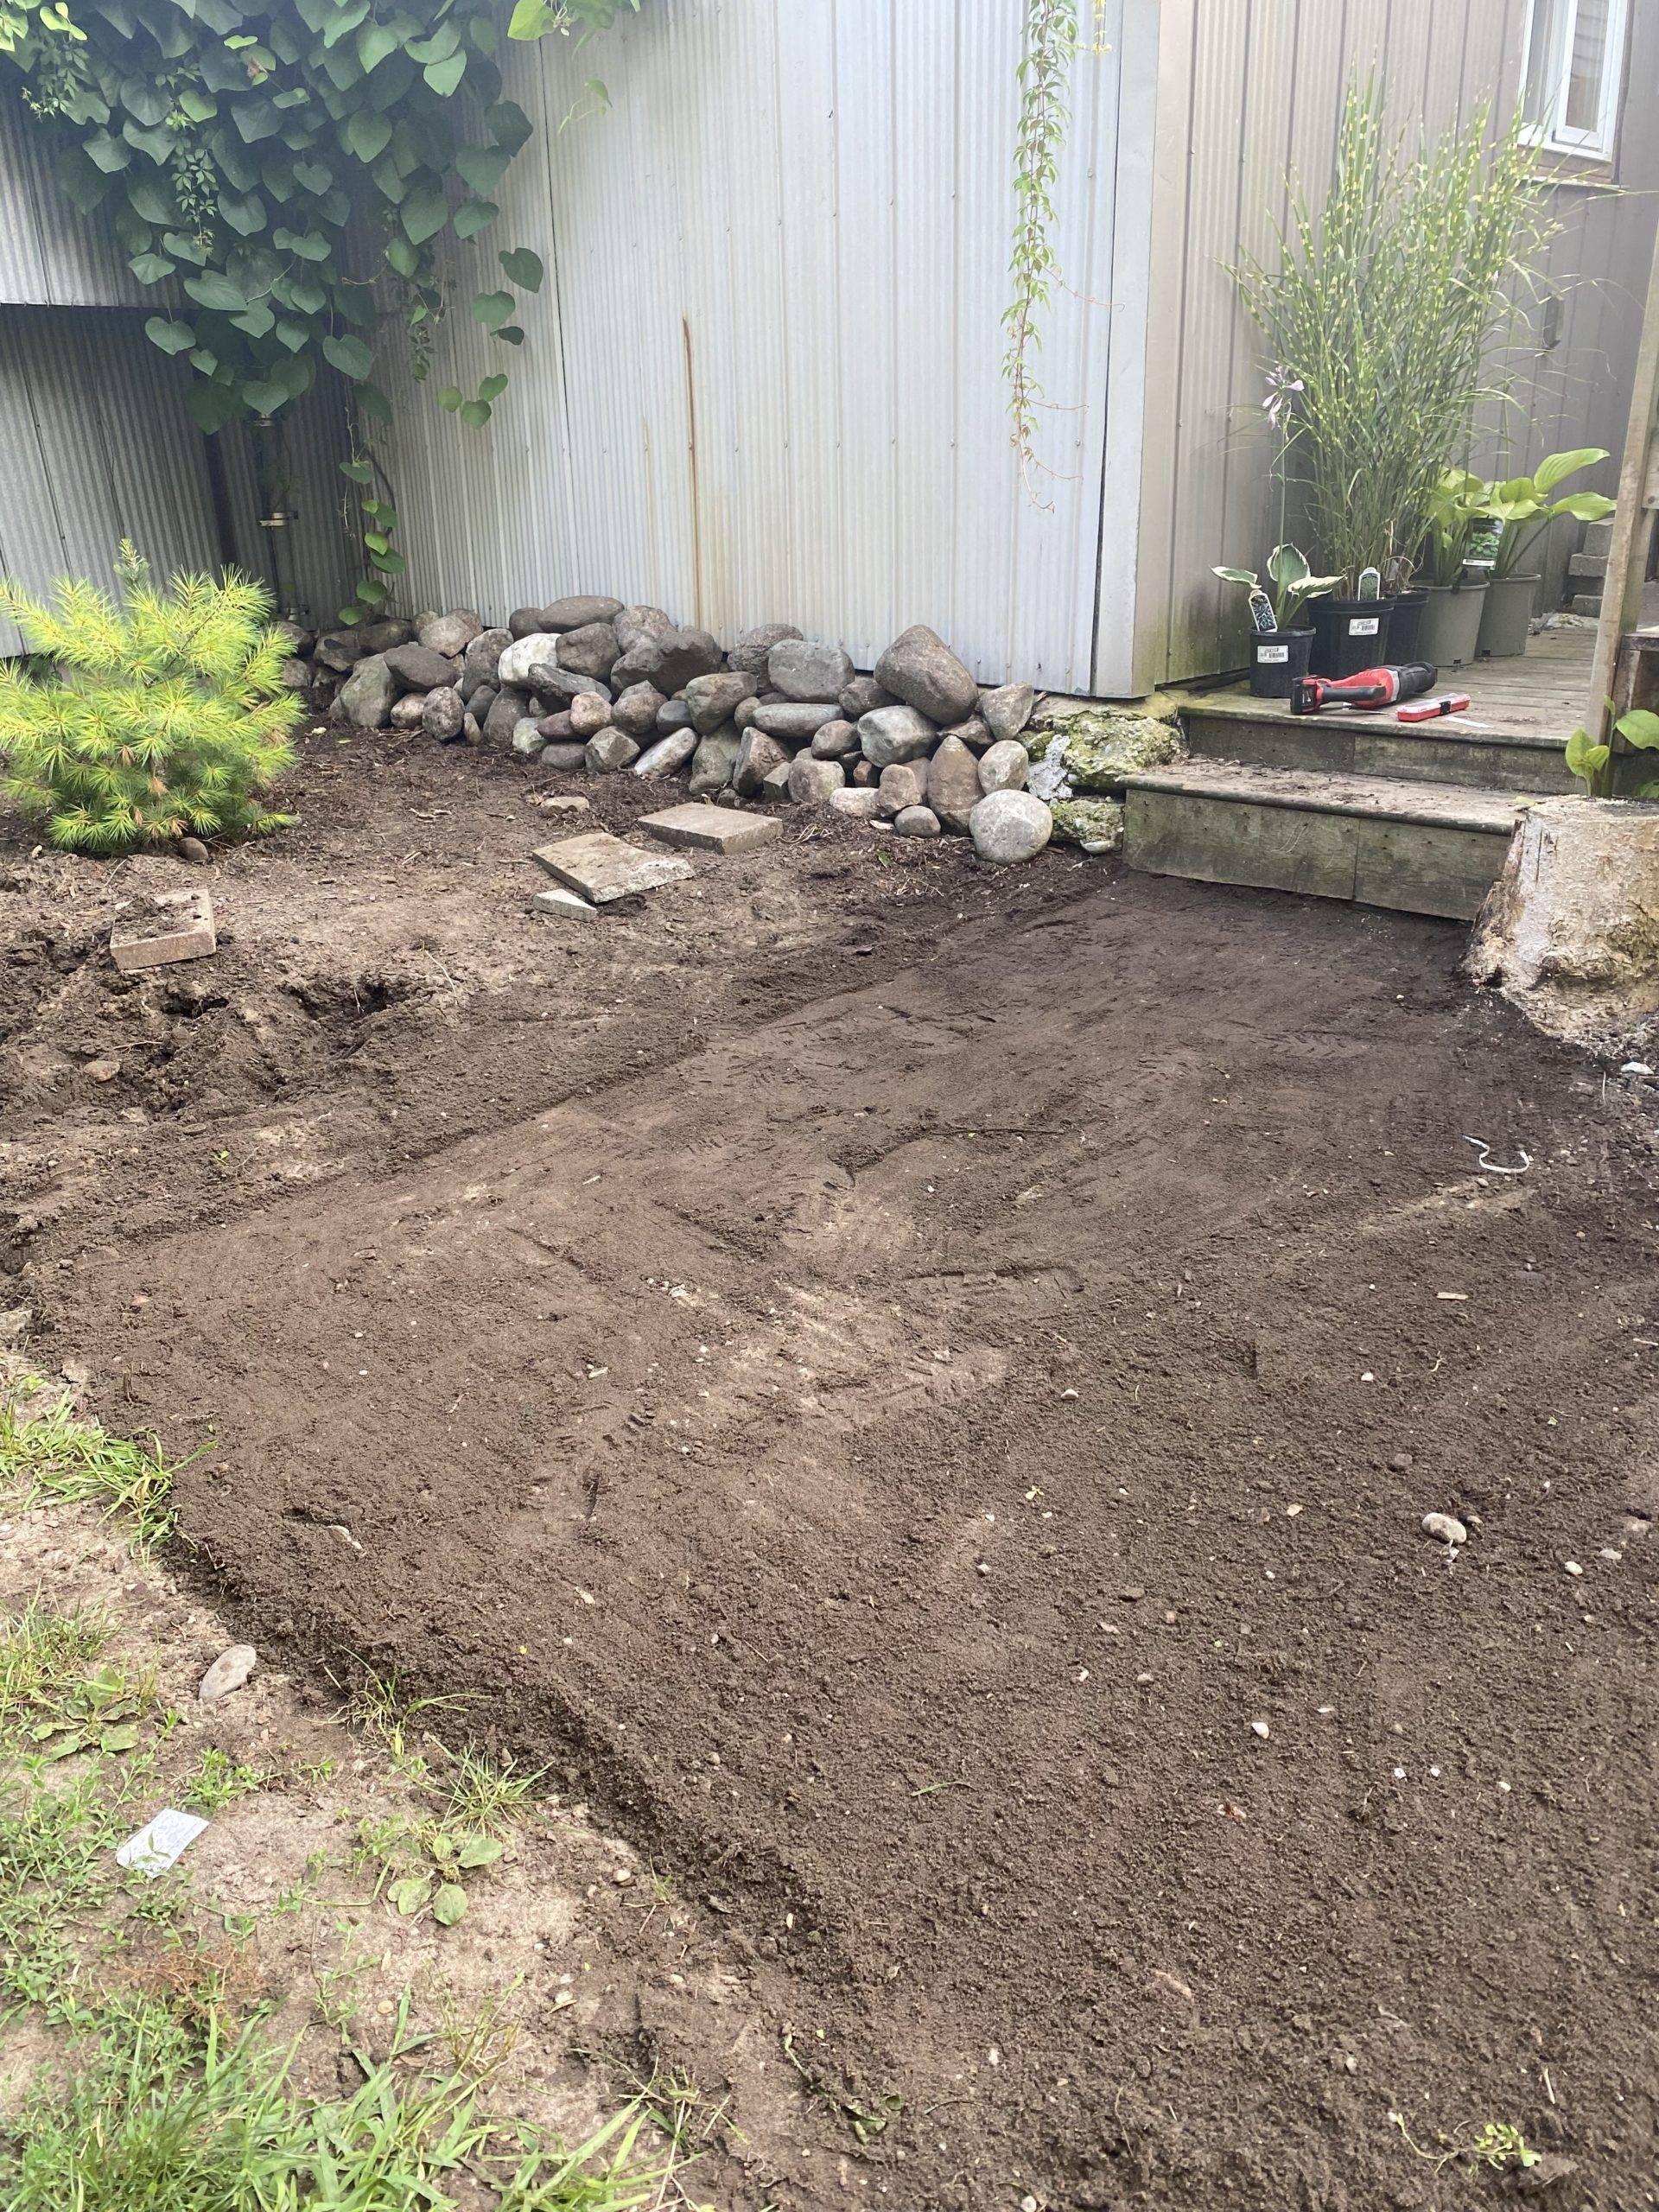 cleared dirt space in backyard